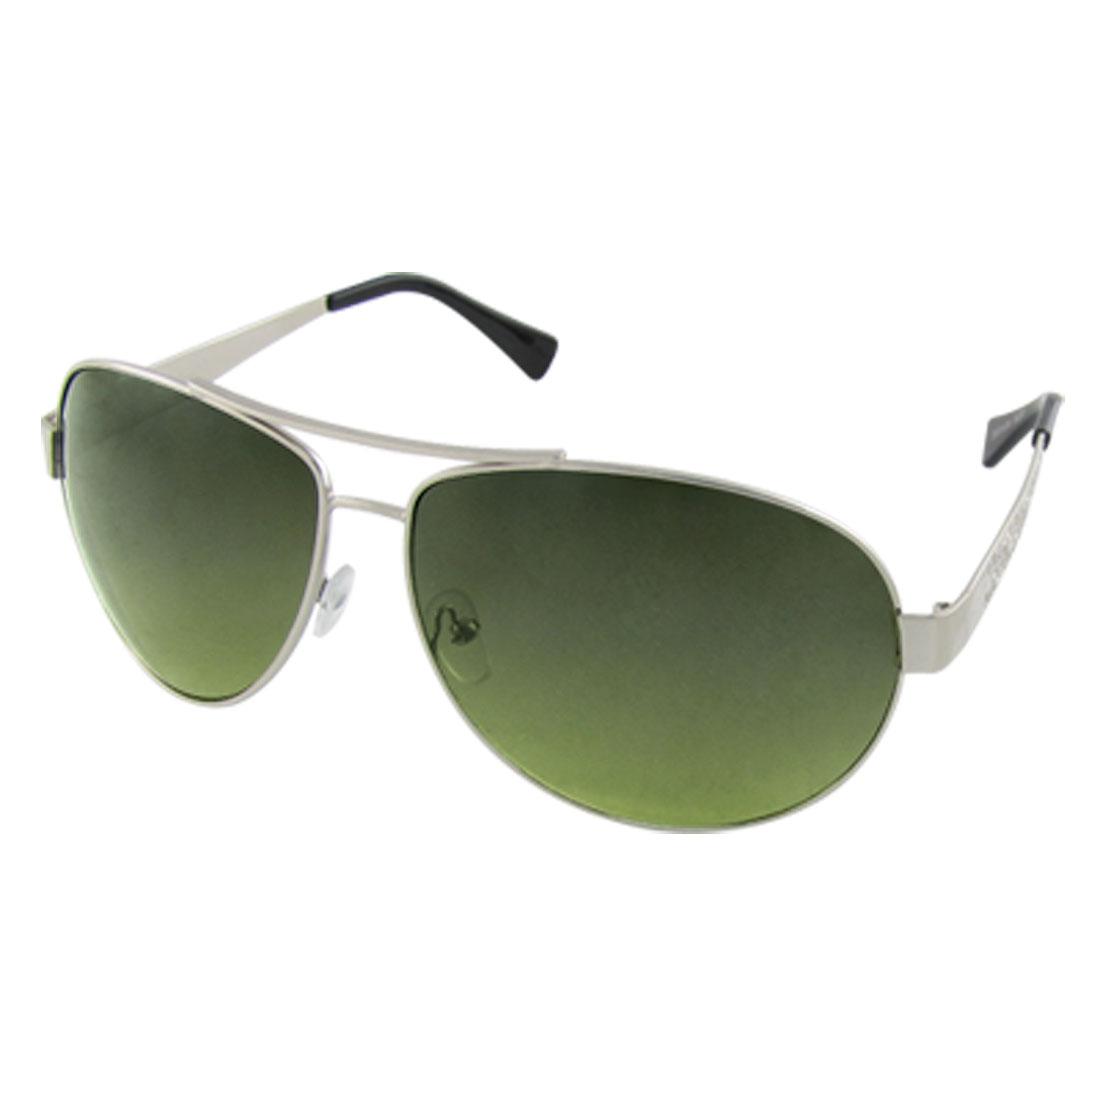 Silver Tone Full Rim Frame Black Plastic Coated Sunglasses